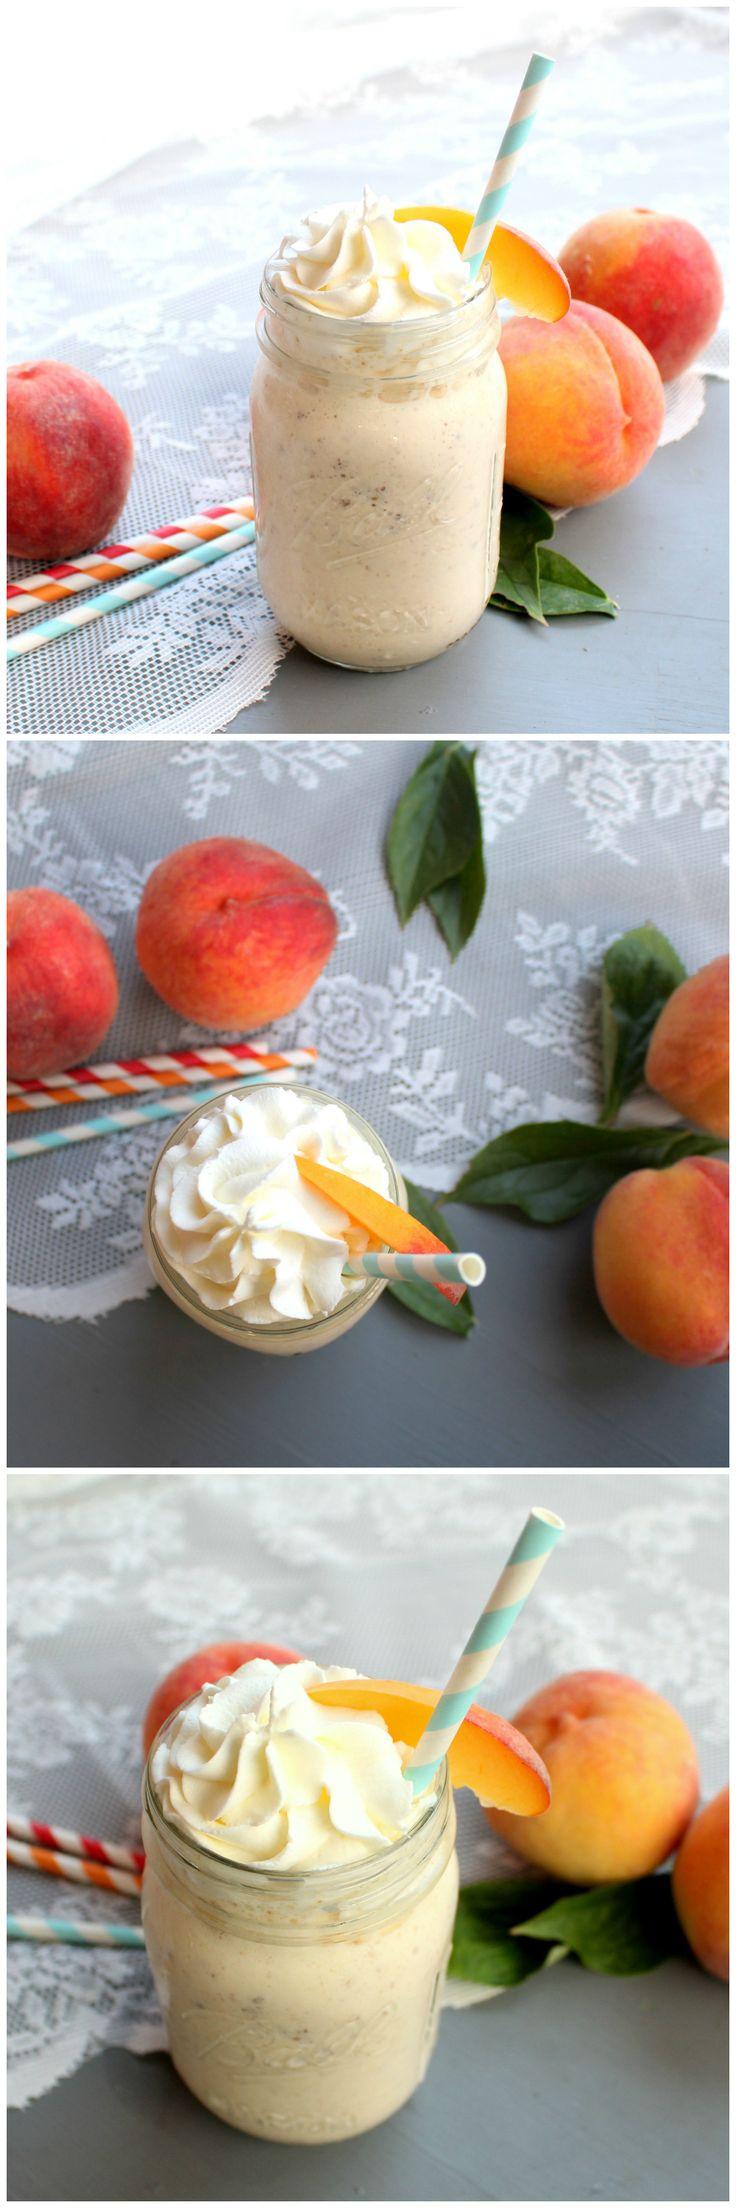 Brown Butter Peach Milkshake